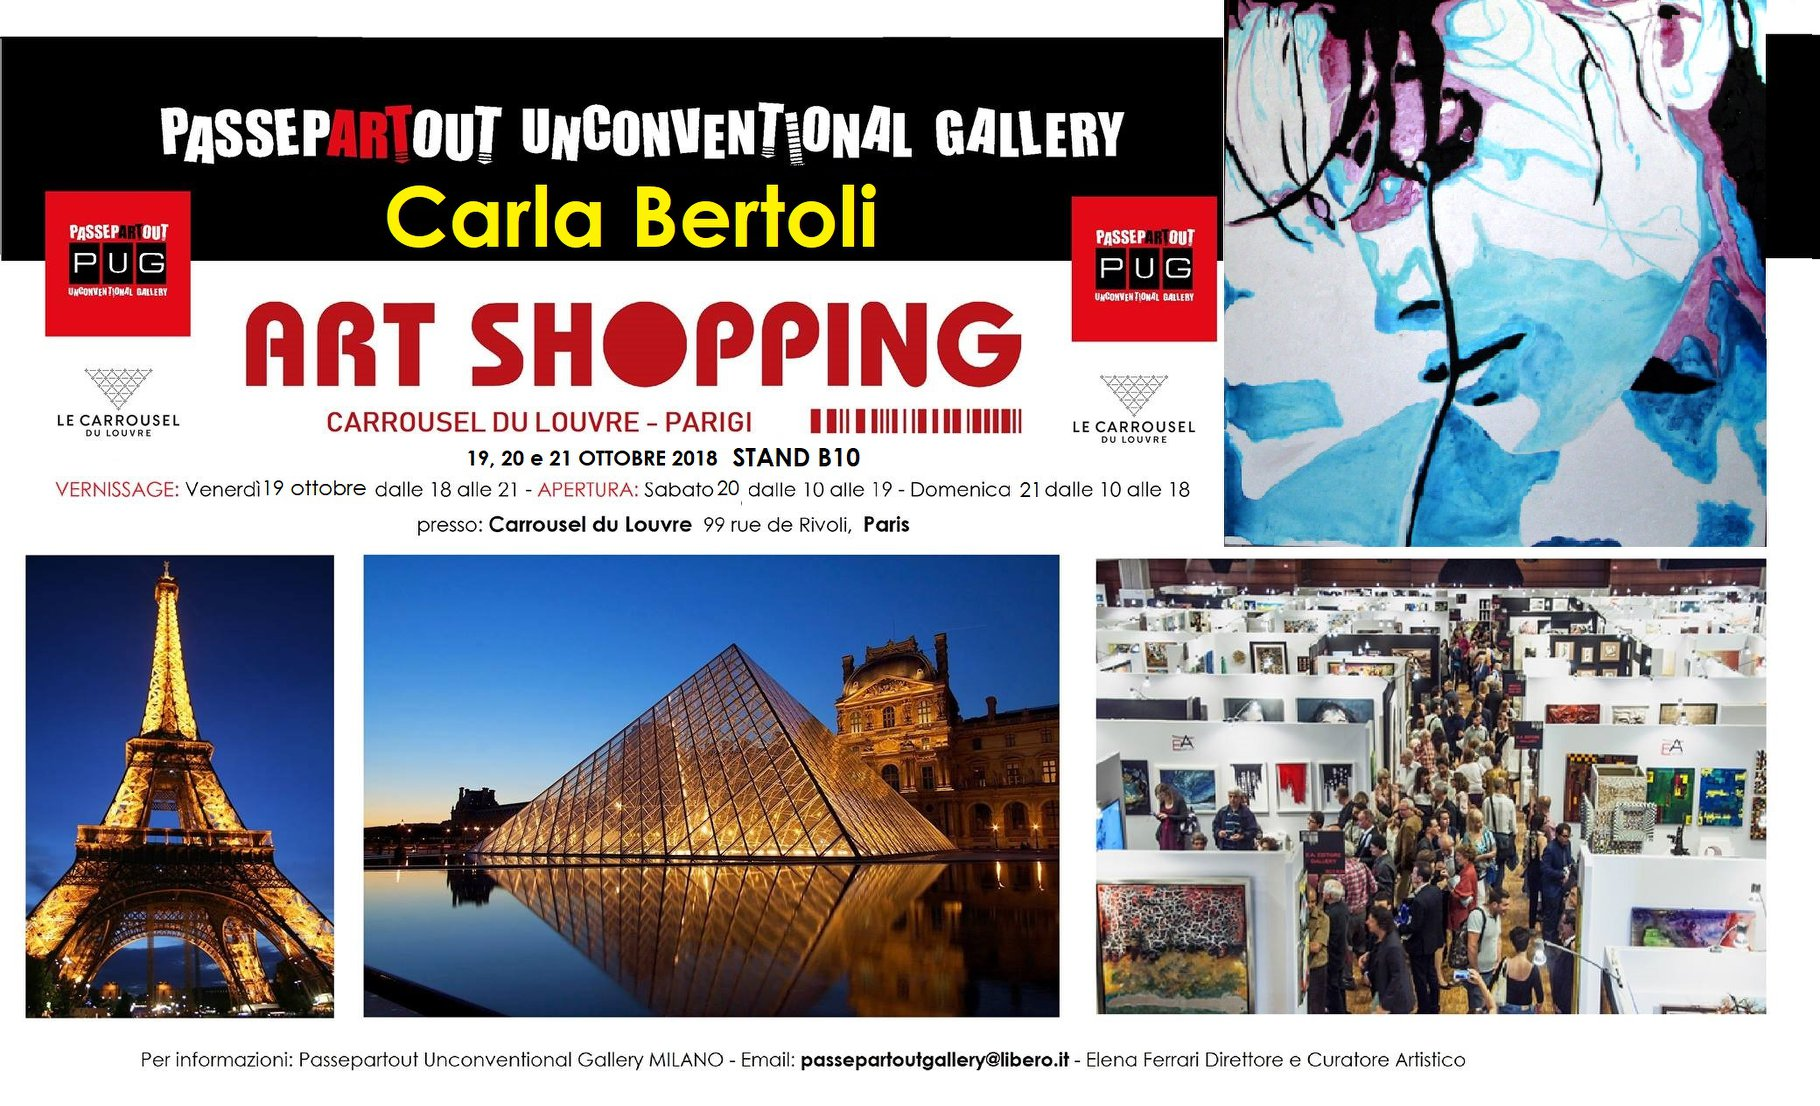 Carla Bertoli Passepartout Unconventional Gallery